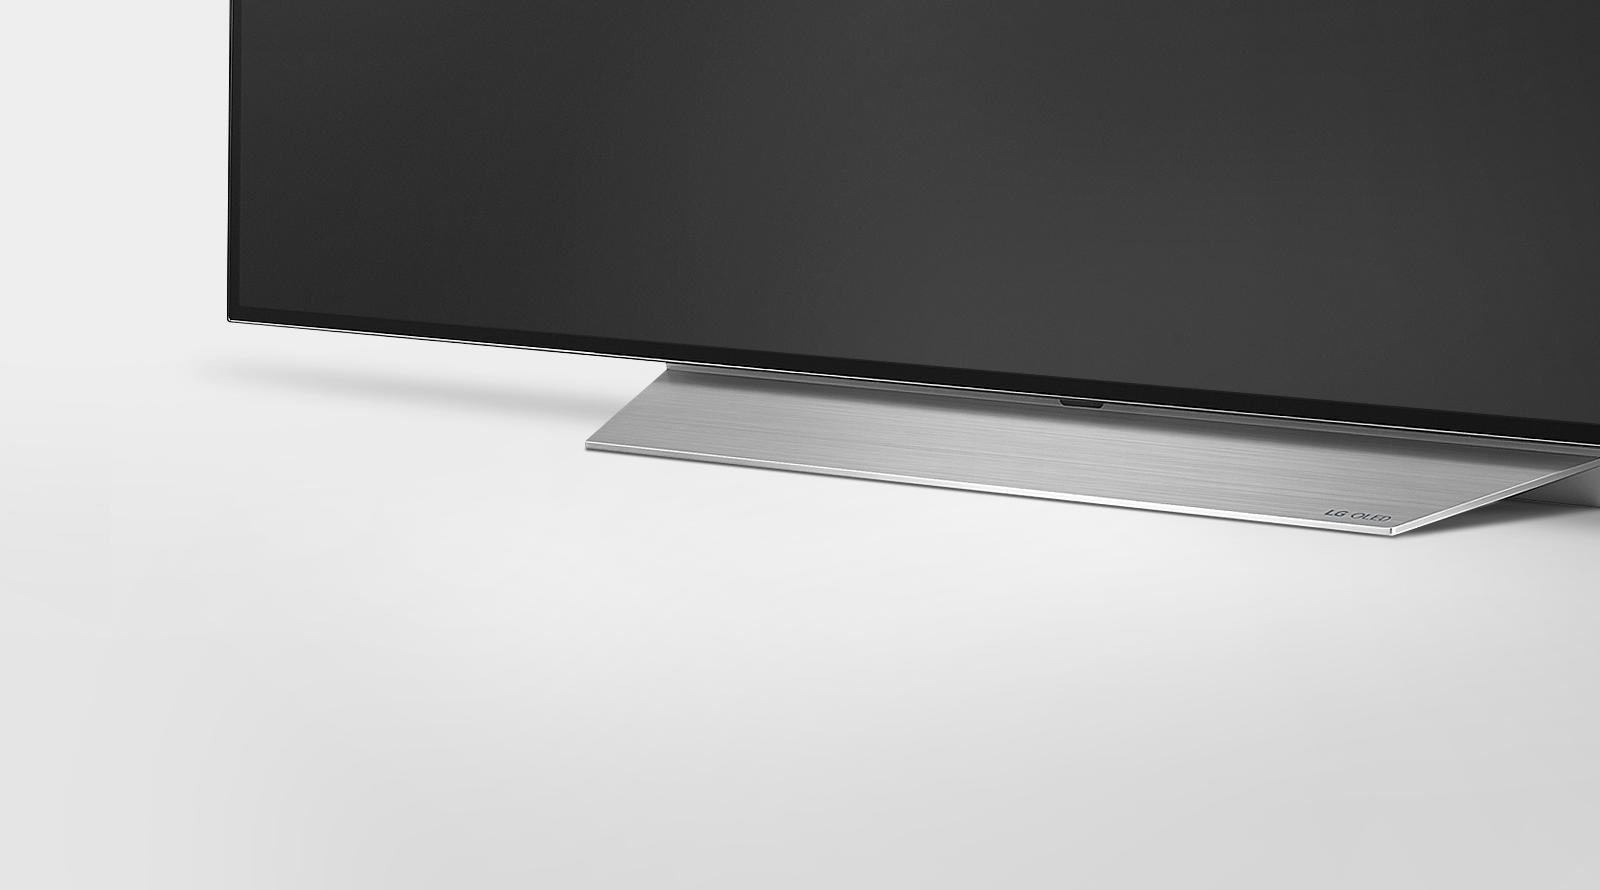 LG전자 : LG 올레드 TV_UHD  OLED55C7K  올레드 TV  TV  TV/AV